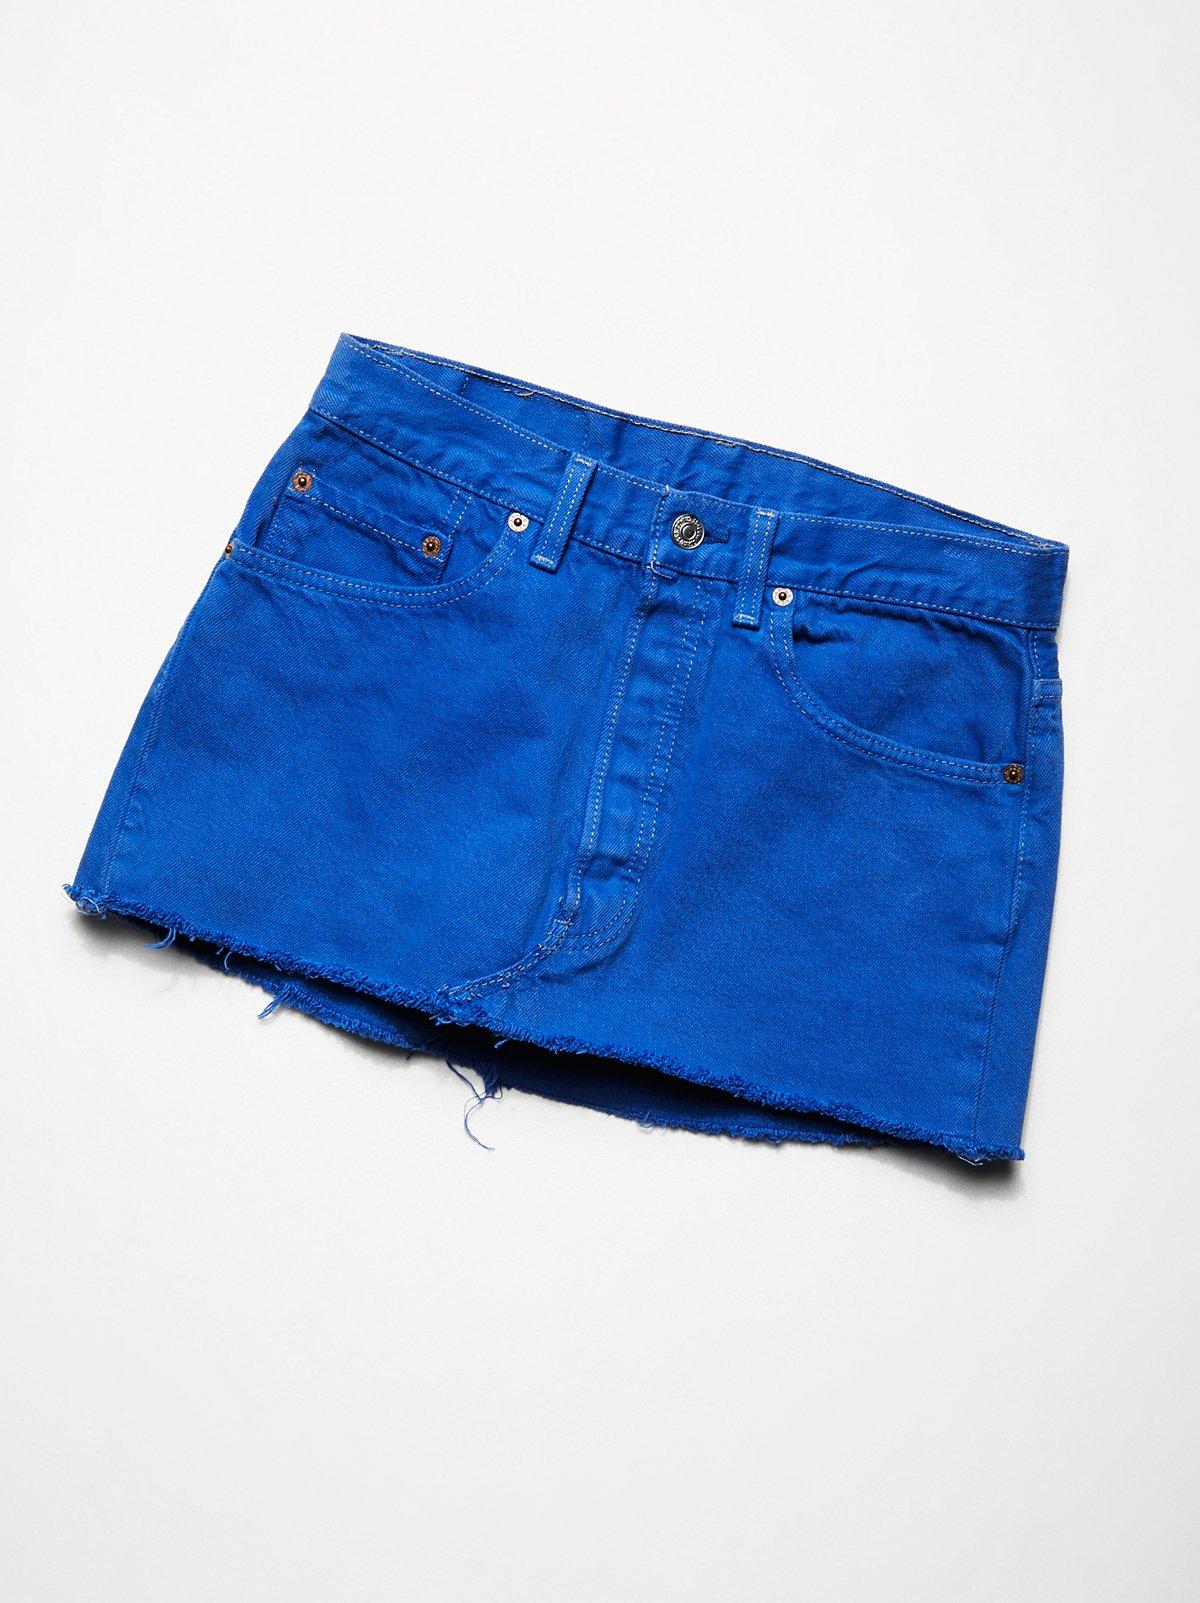 Vintage 1990s Overdyed Mini Skirt